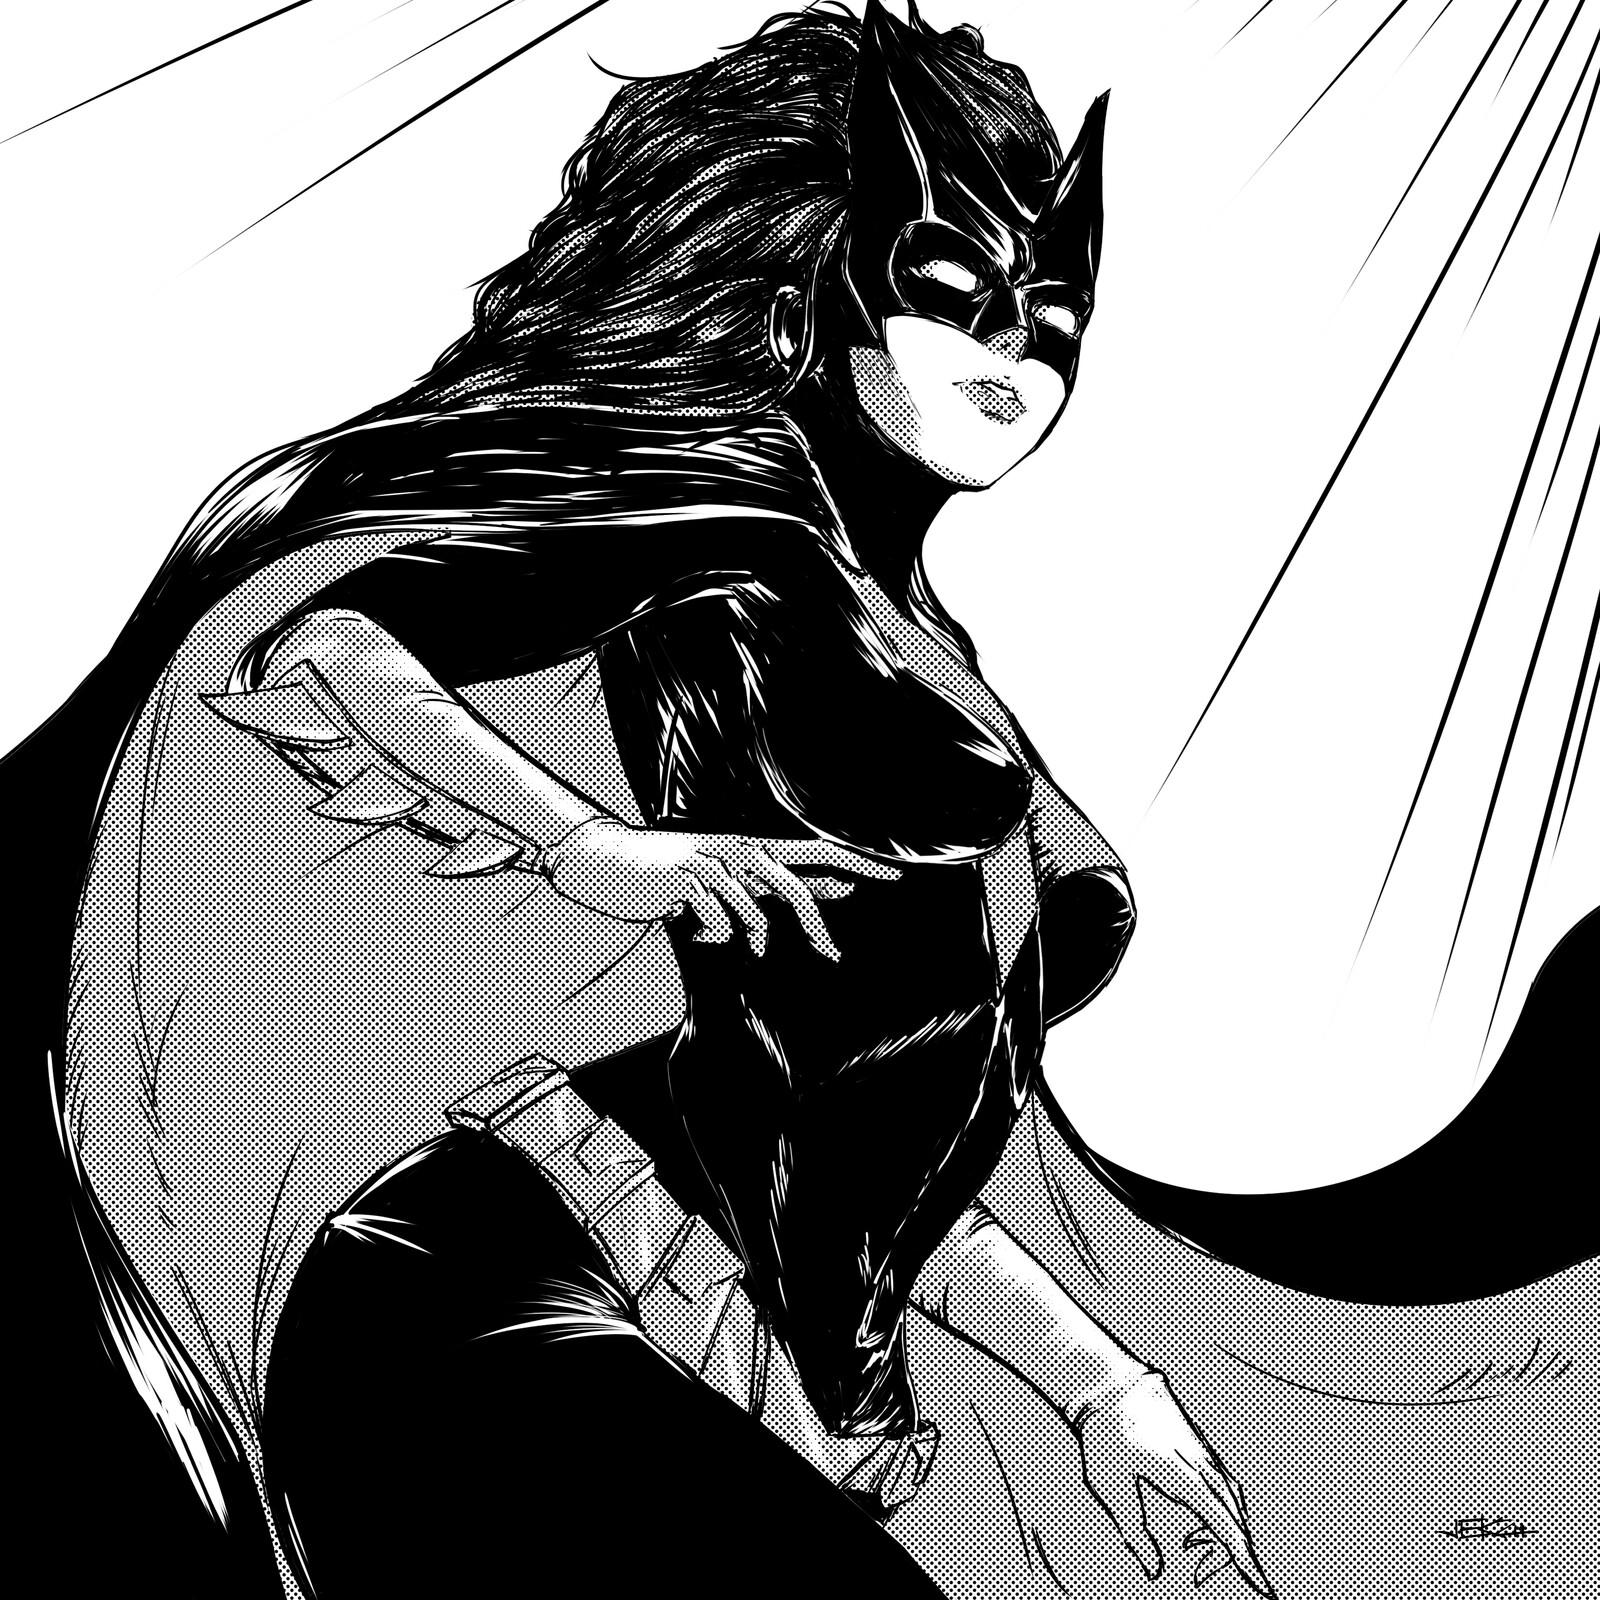 Inktober 2019 (Day 01/31) - Batwoman of DC Comics